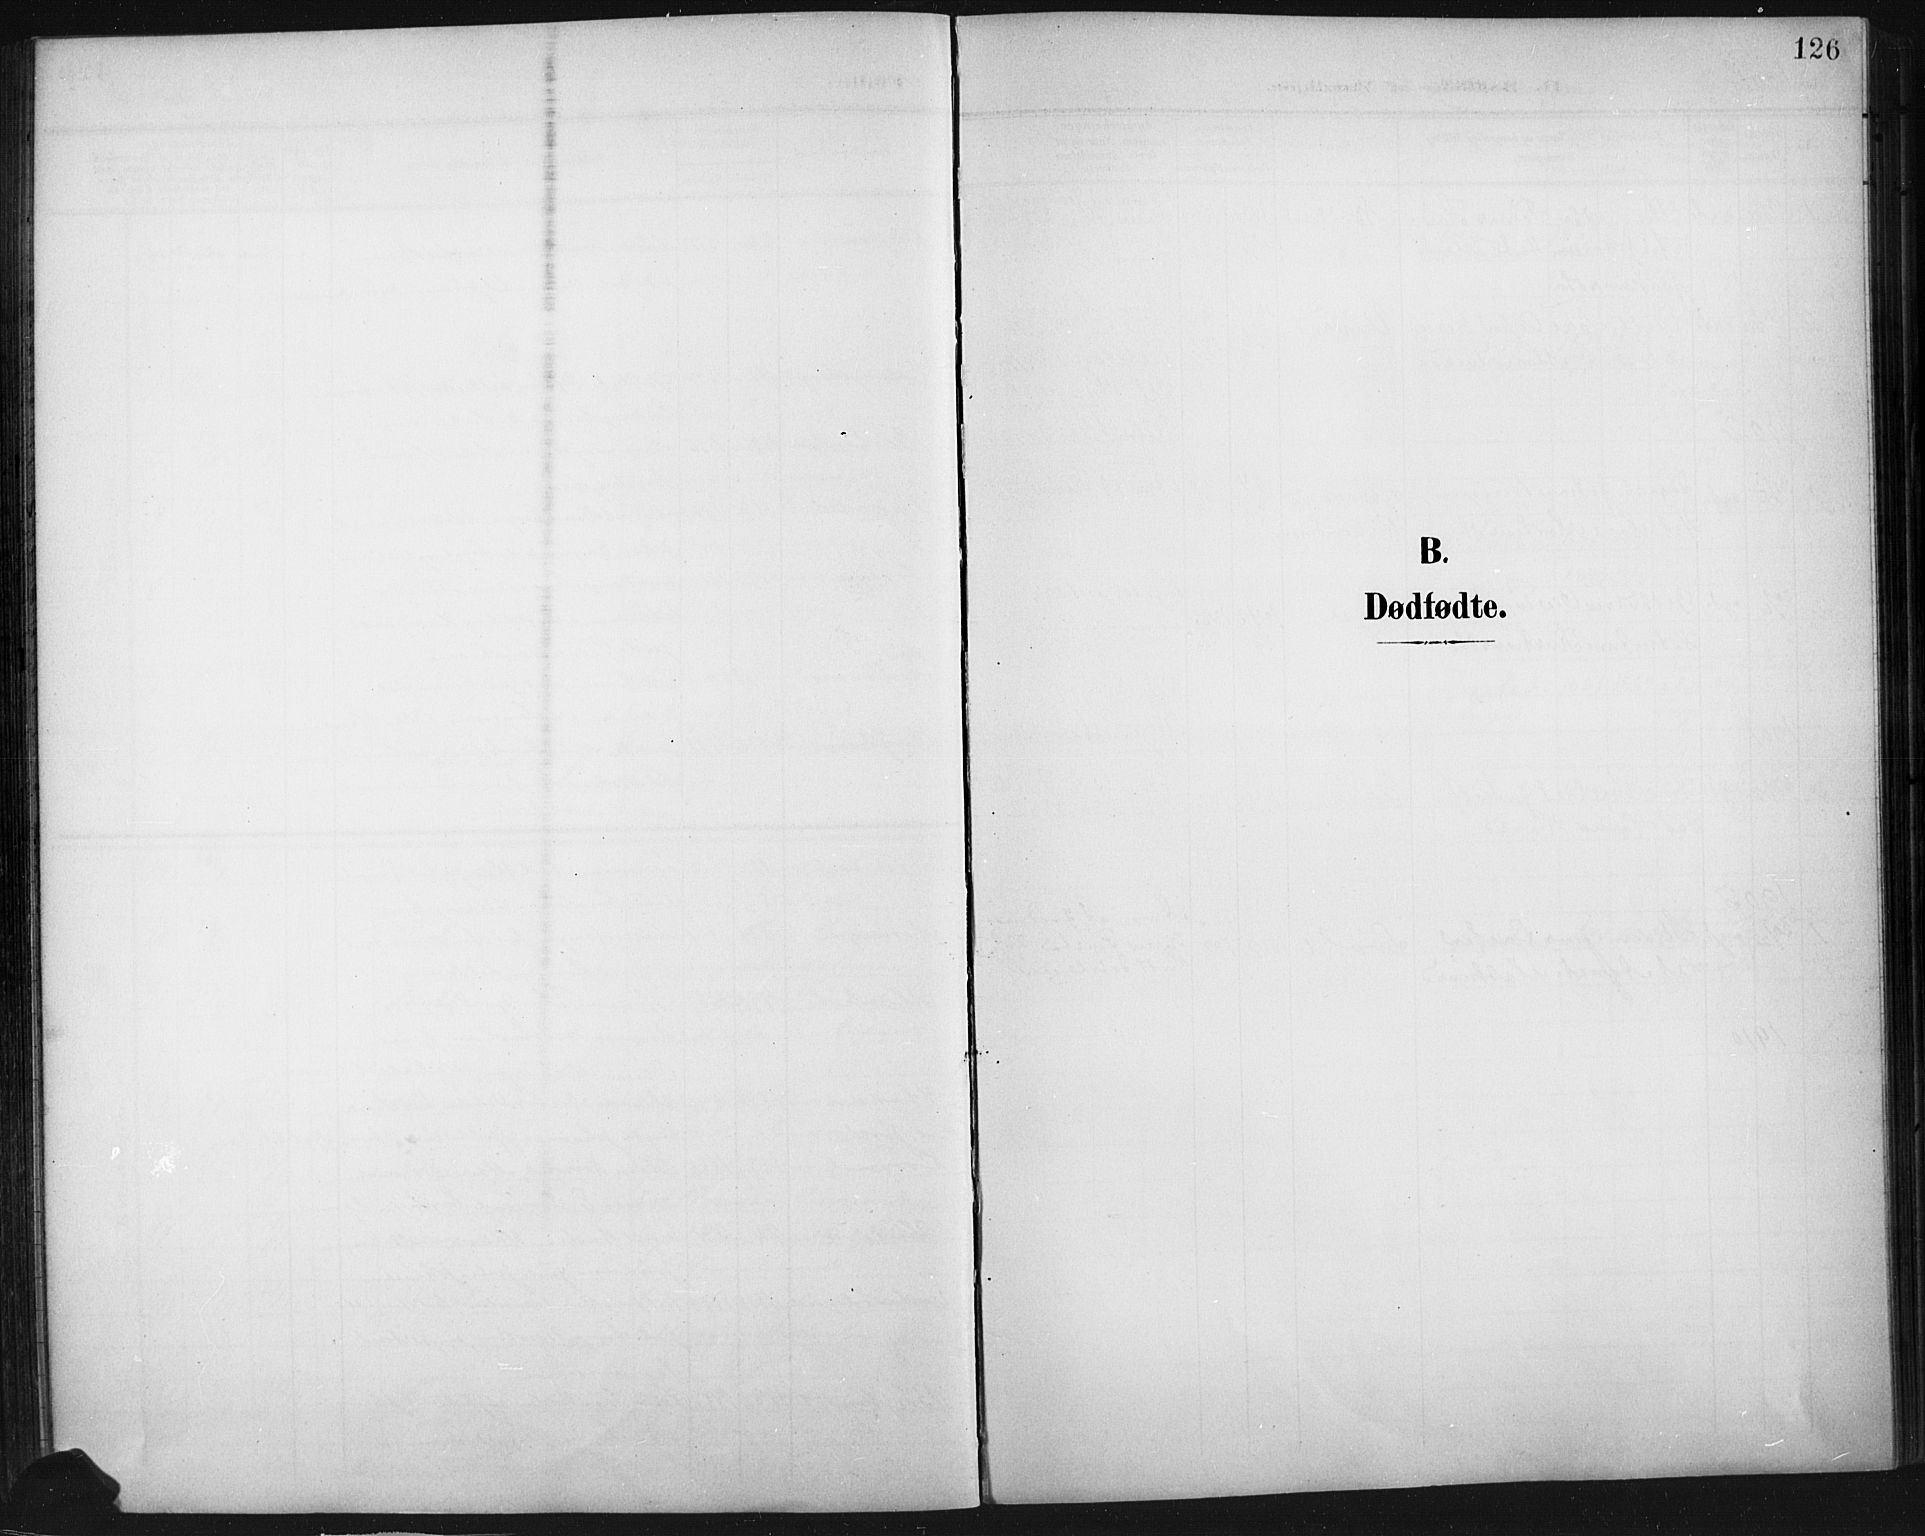 SAH, Fåberg prestekontor, Klokkerbok nr. 11, 1901-1921, s. 126